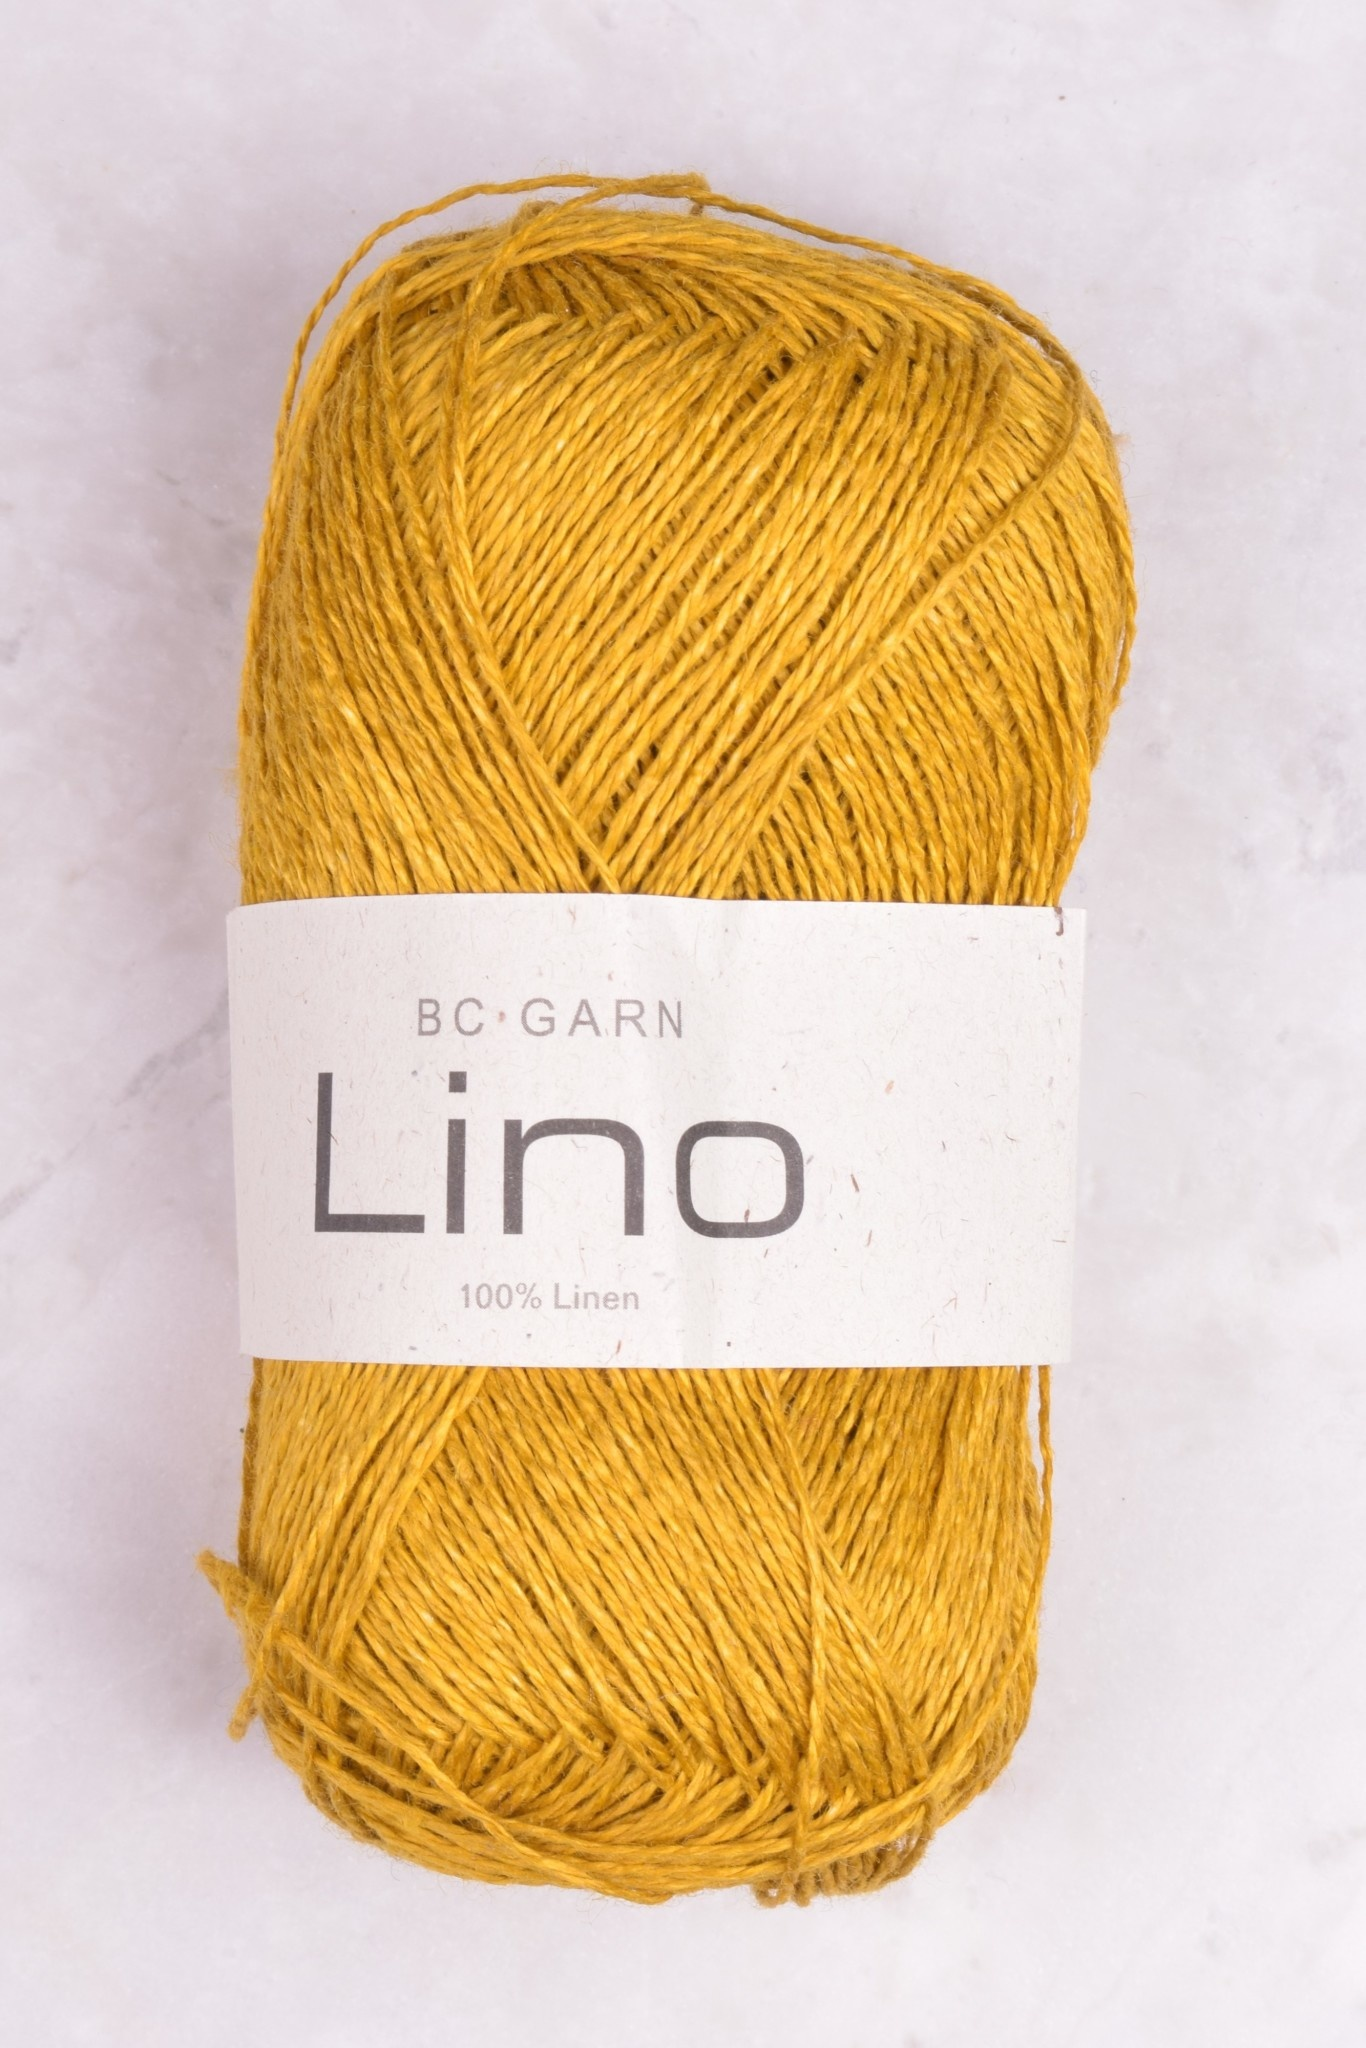 Image of BC Garn Lino 35 Curry